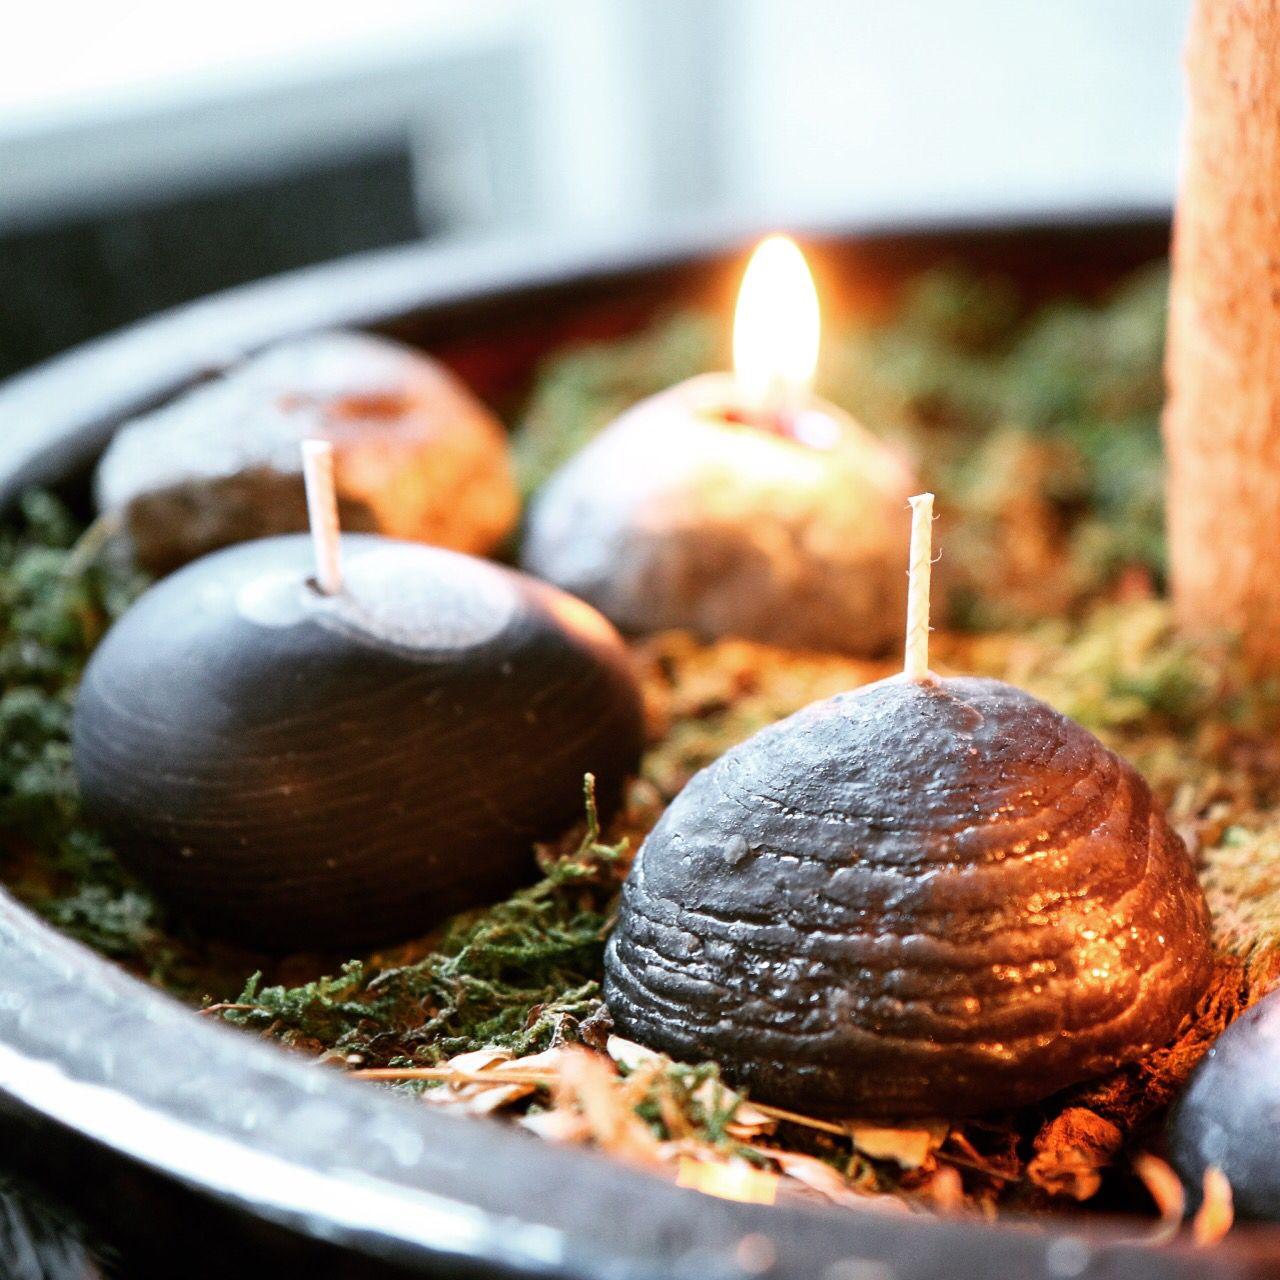 Stone candle